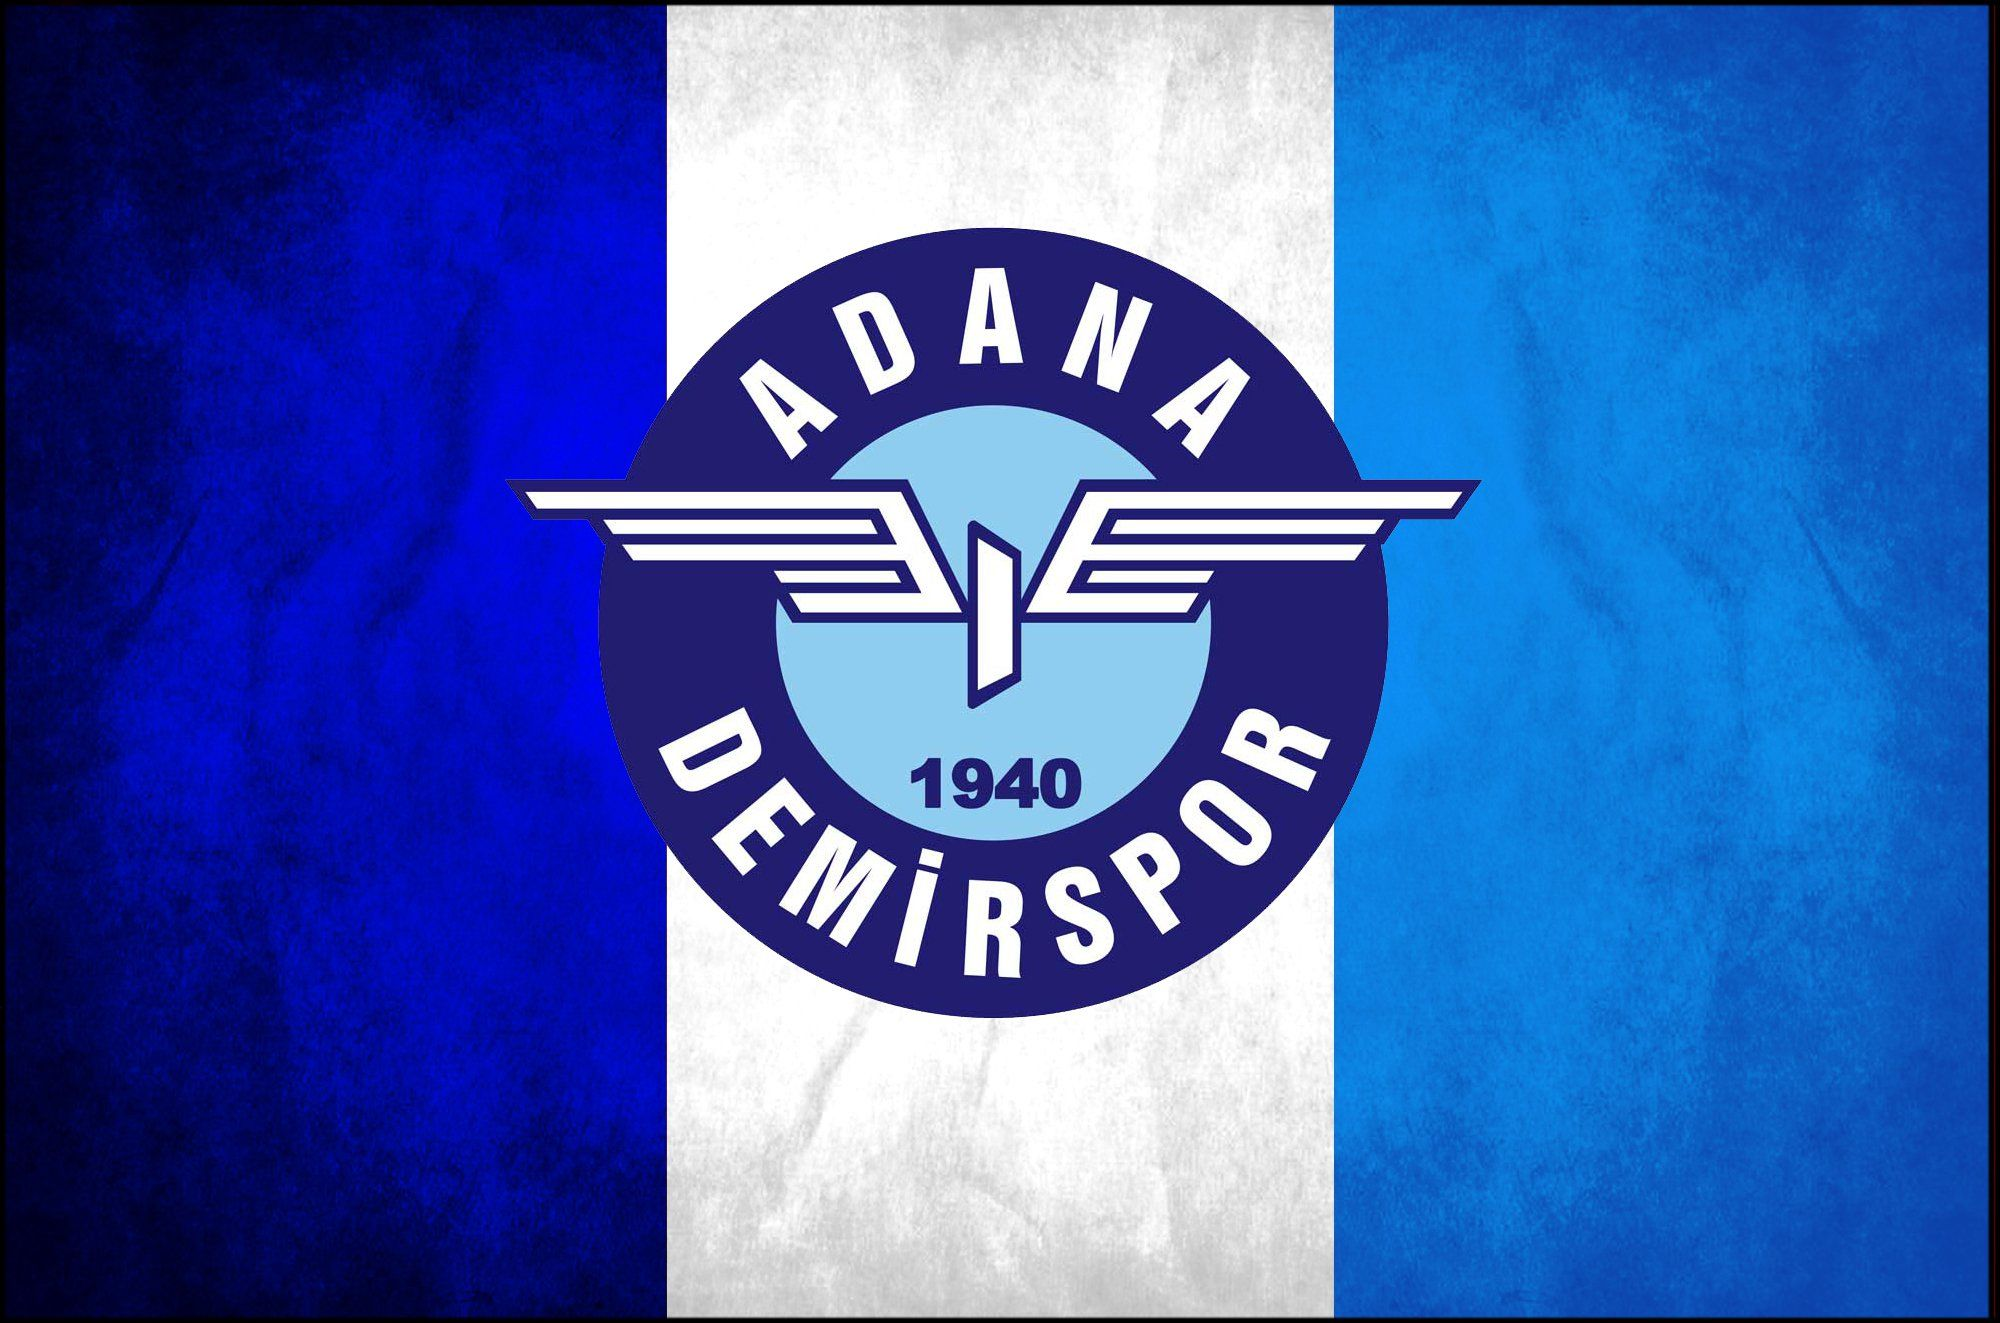 Adana Demirspor Ayi Spor Logolar